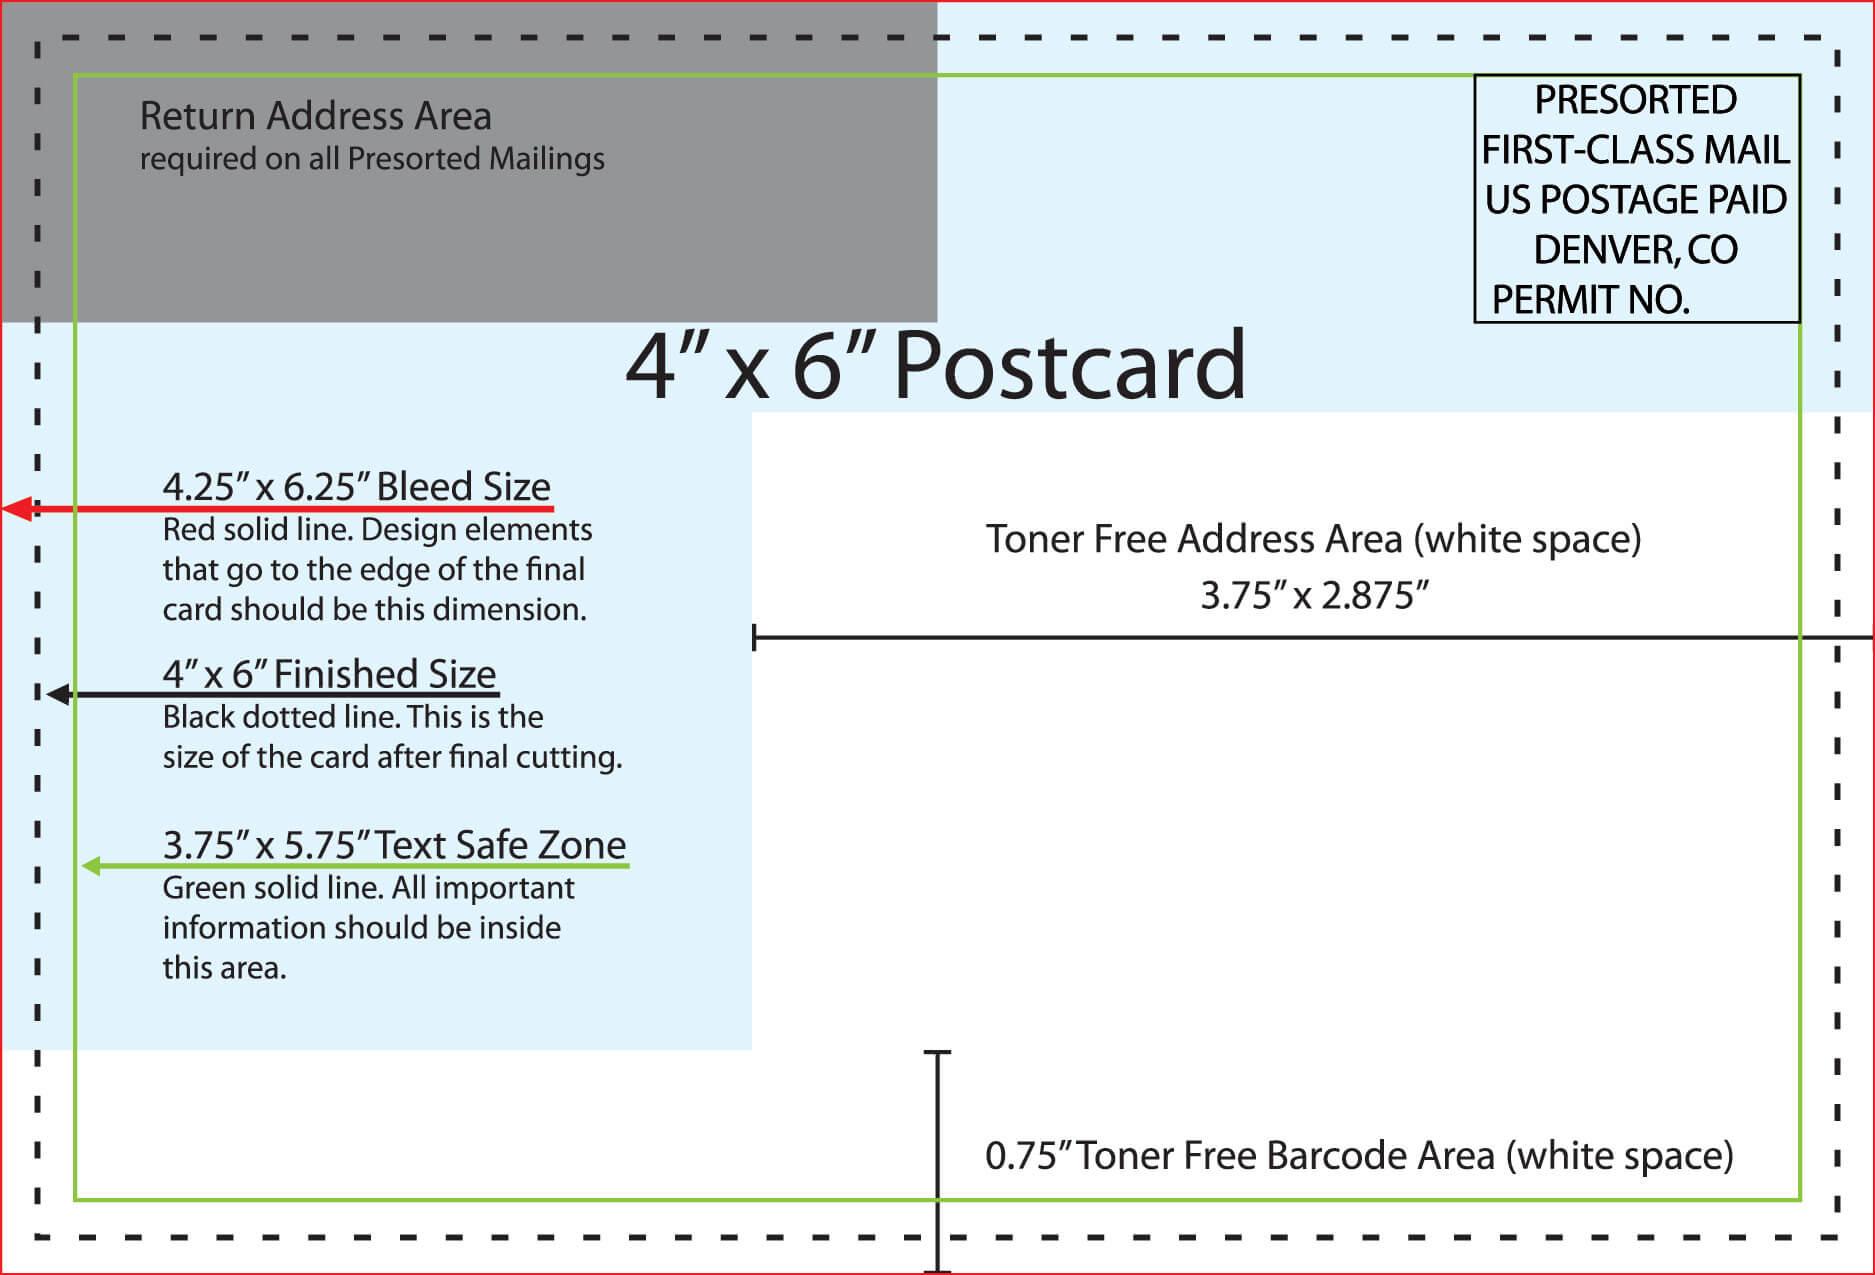 4X6 Postcard - Colona.rsd7 Pertaining To 4 X 6 Postcard Template